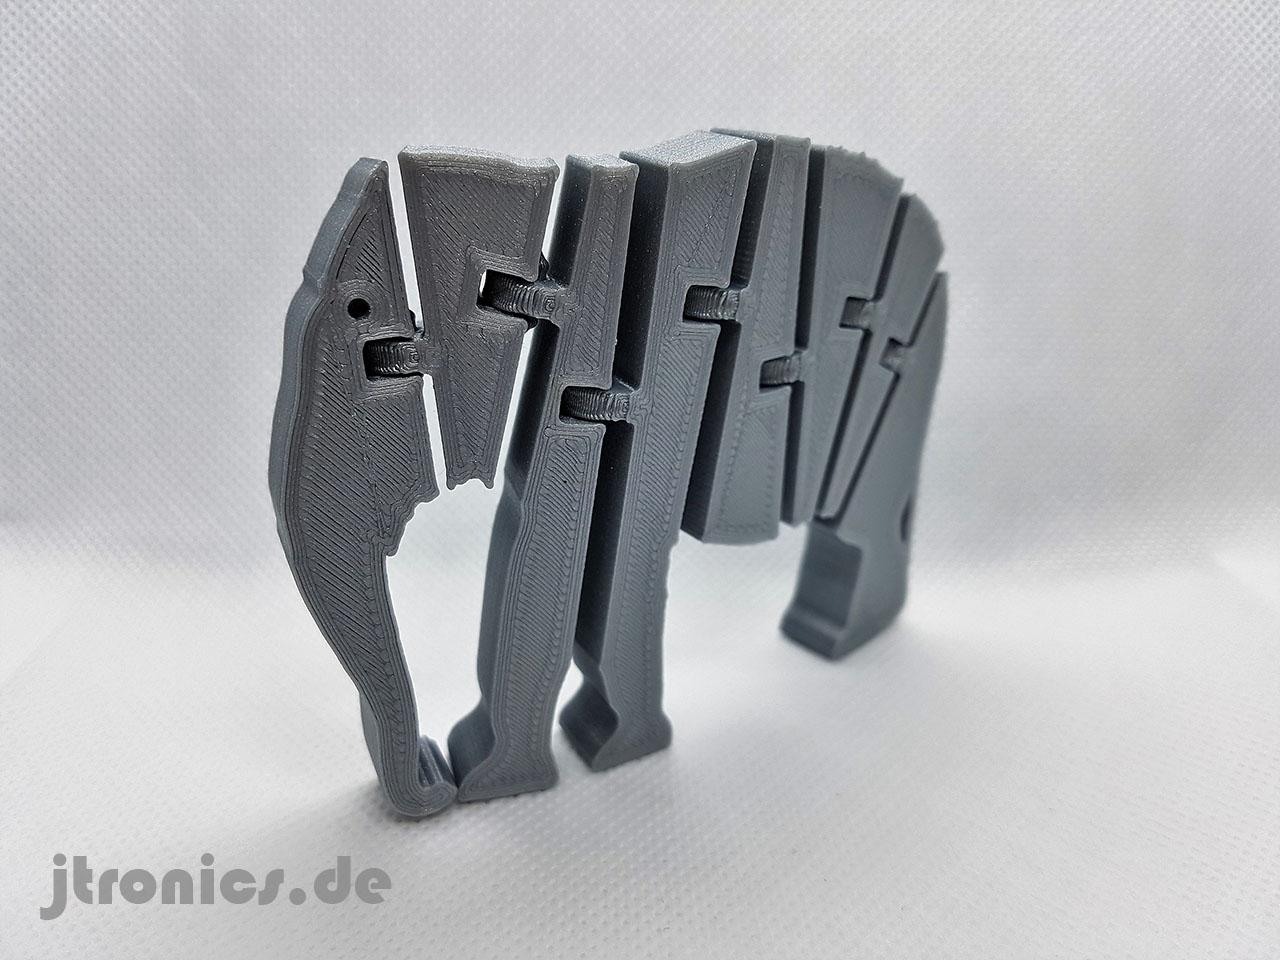 20190524_214025.jpg Download free STL file Flexi Articulated Elephant • 3D printable model, jtronics